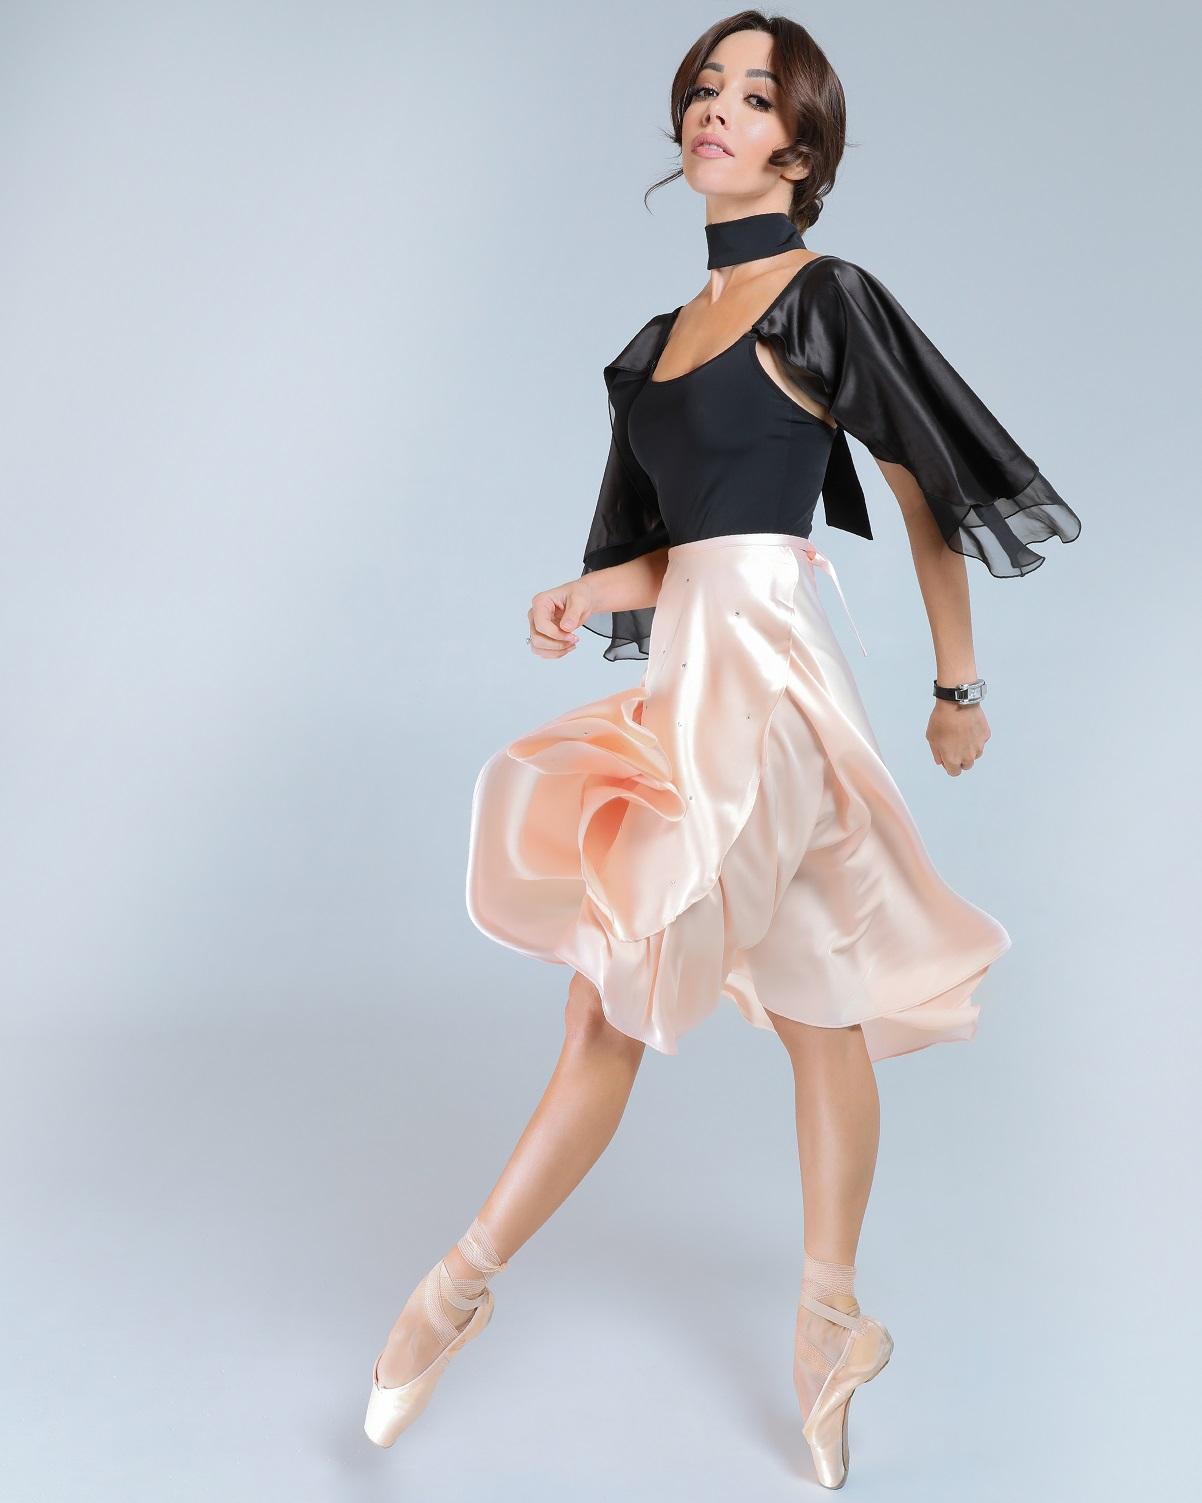 Катерина Кухар изобрела крылья бабочки-Фото 4